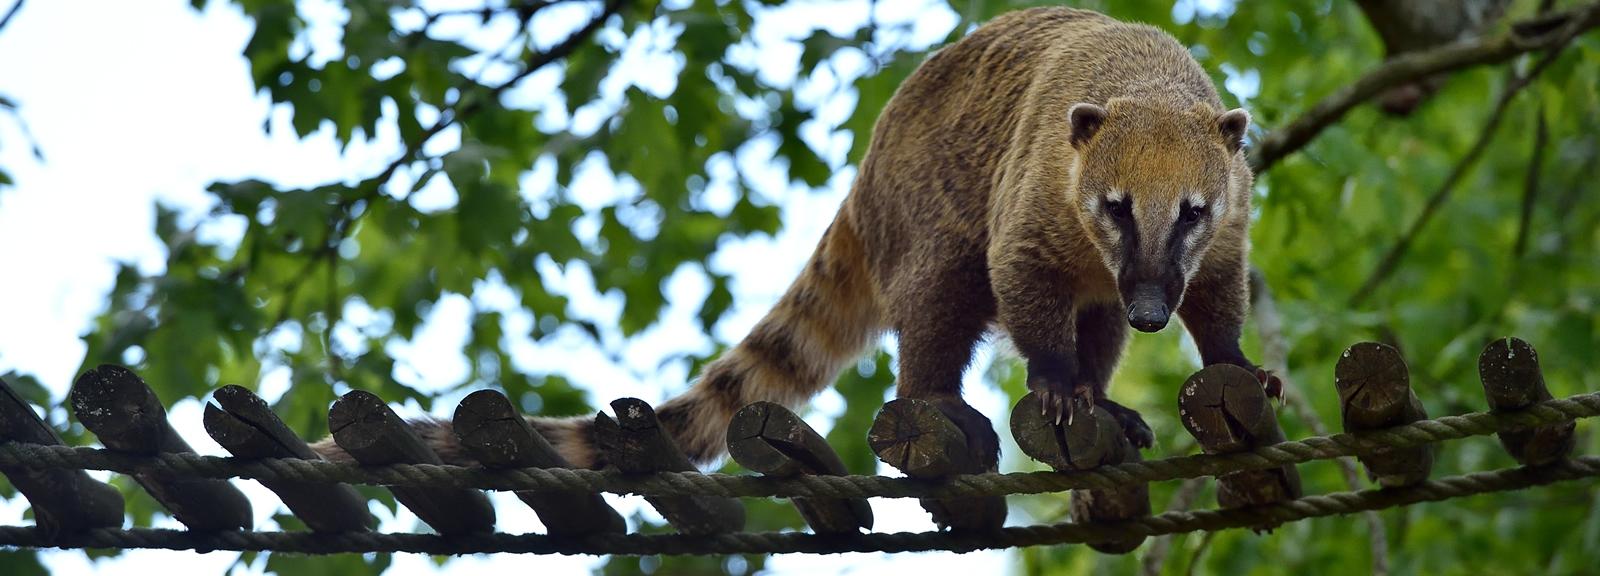 Coati roux © MNHN - F-G Grandin